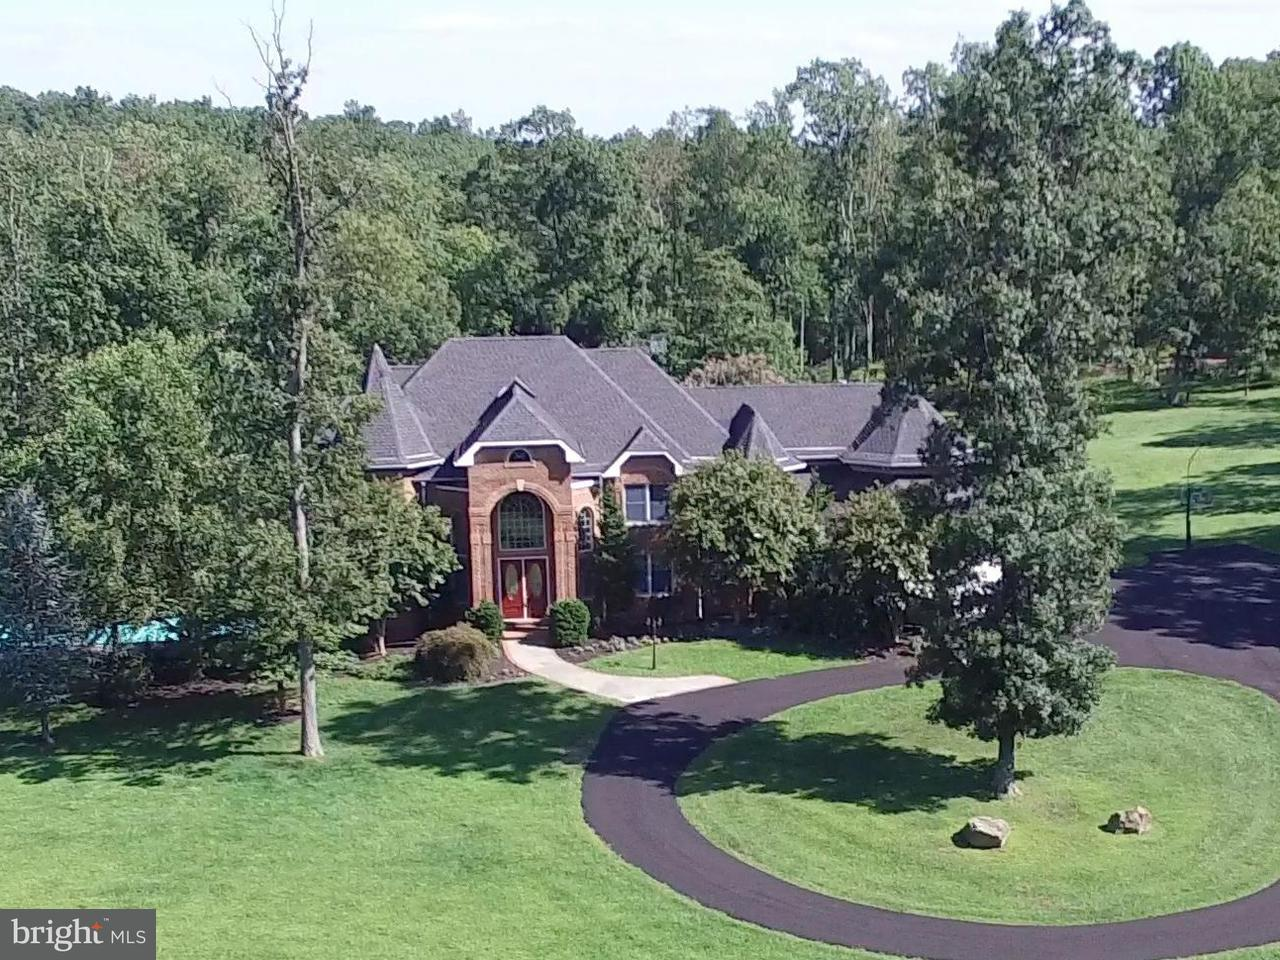 独户住宅 为 销售 在 41155 Trotter Lane 41155 Trotter Lane Paeonian Springs, 弗吉尼亚州 20129 美国